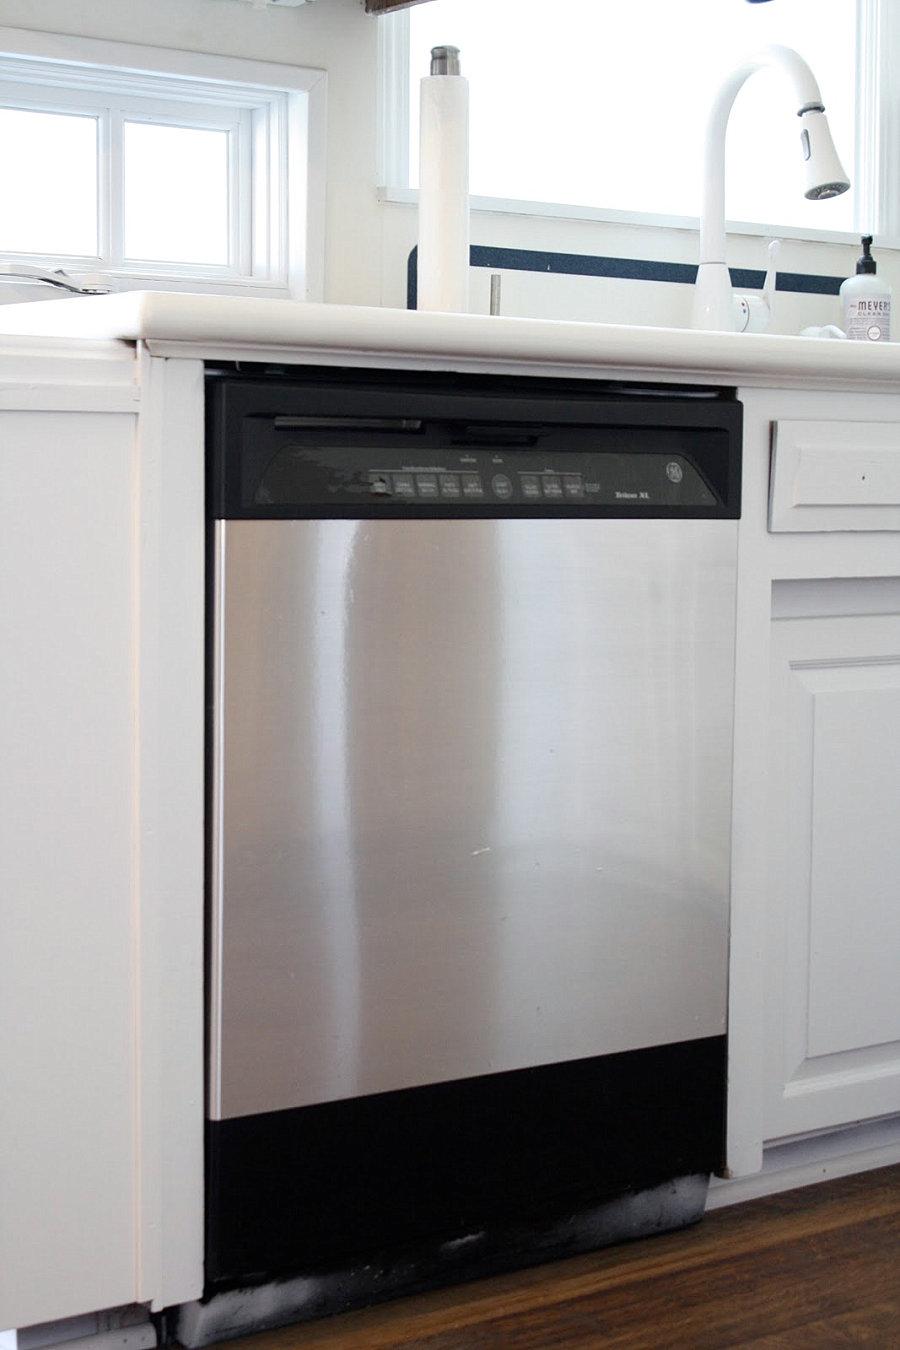 Кухонная техника, окрашенная под нержавеющую сталь